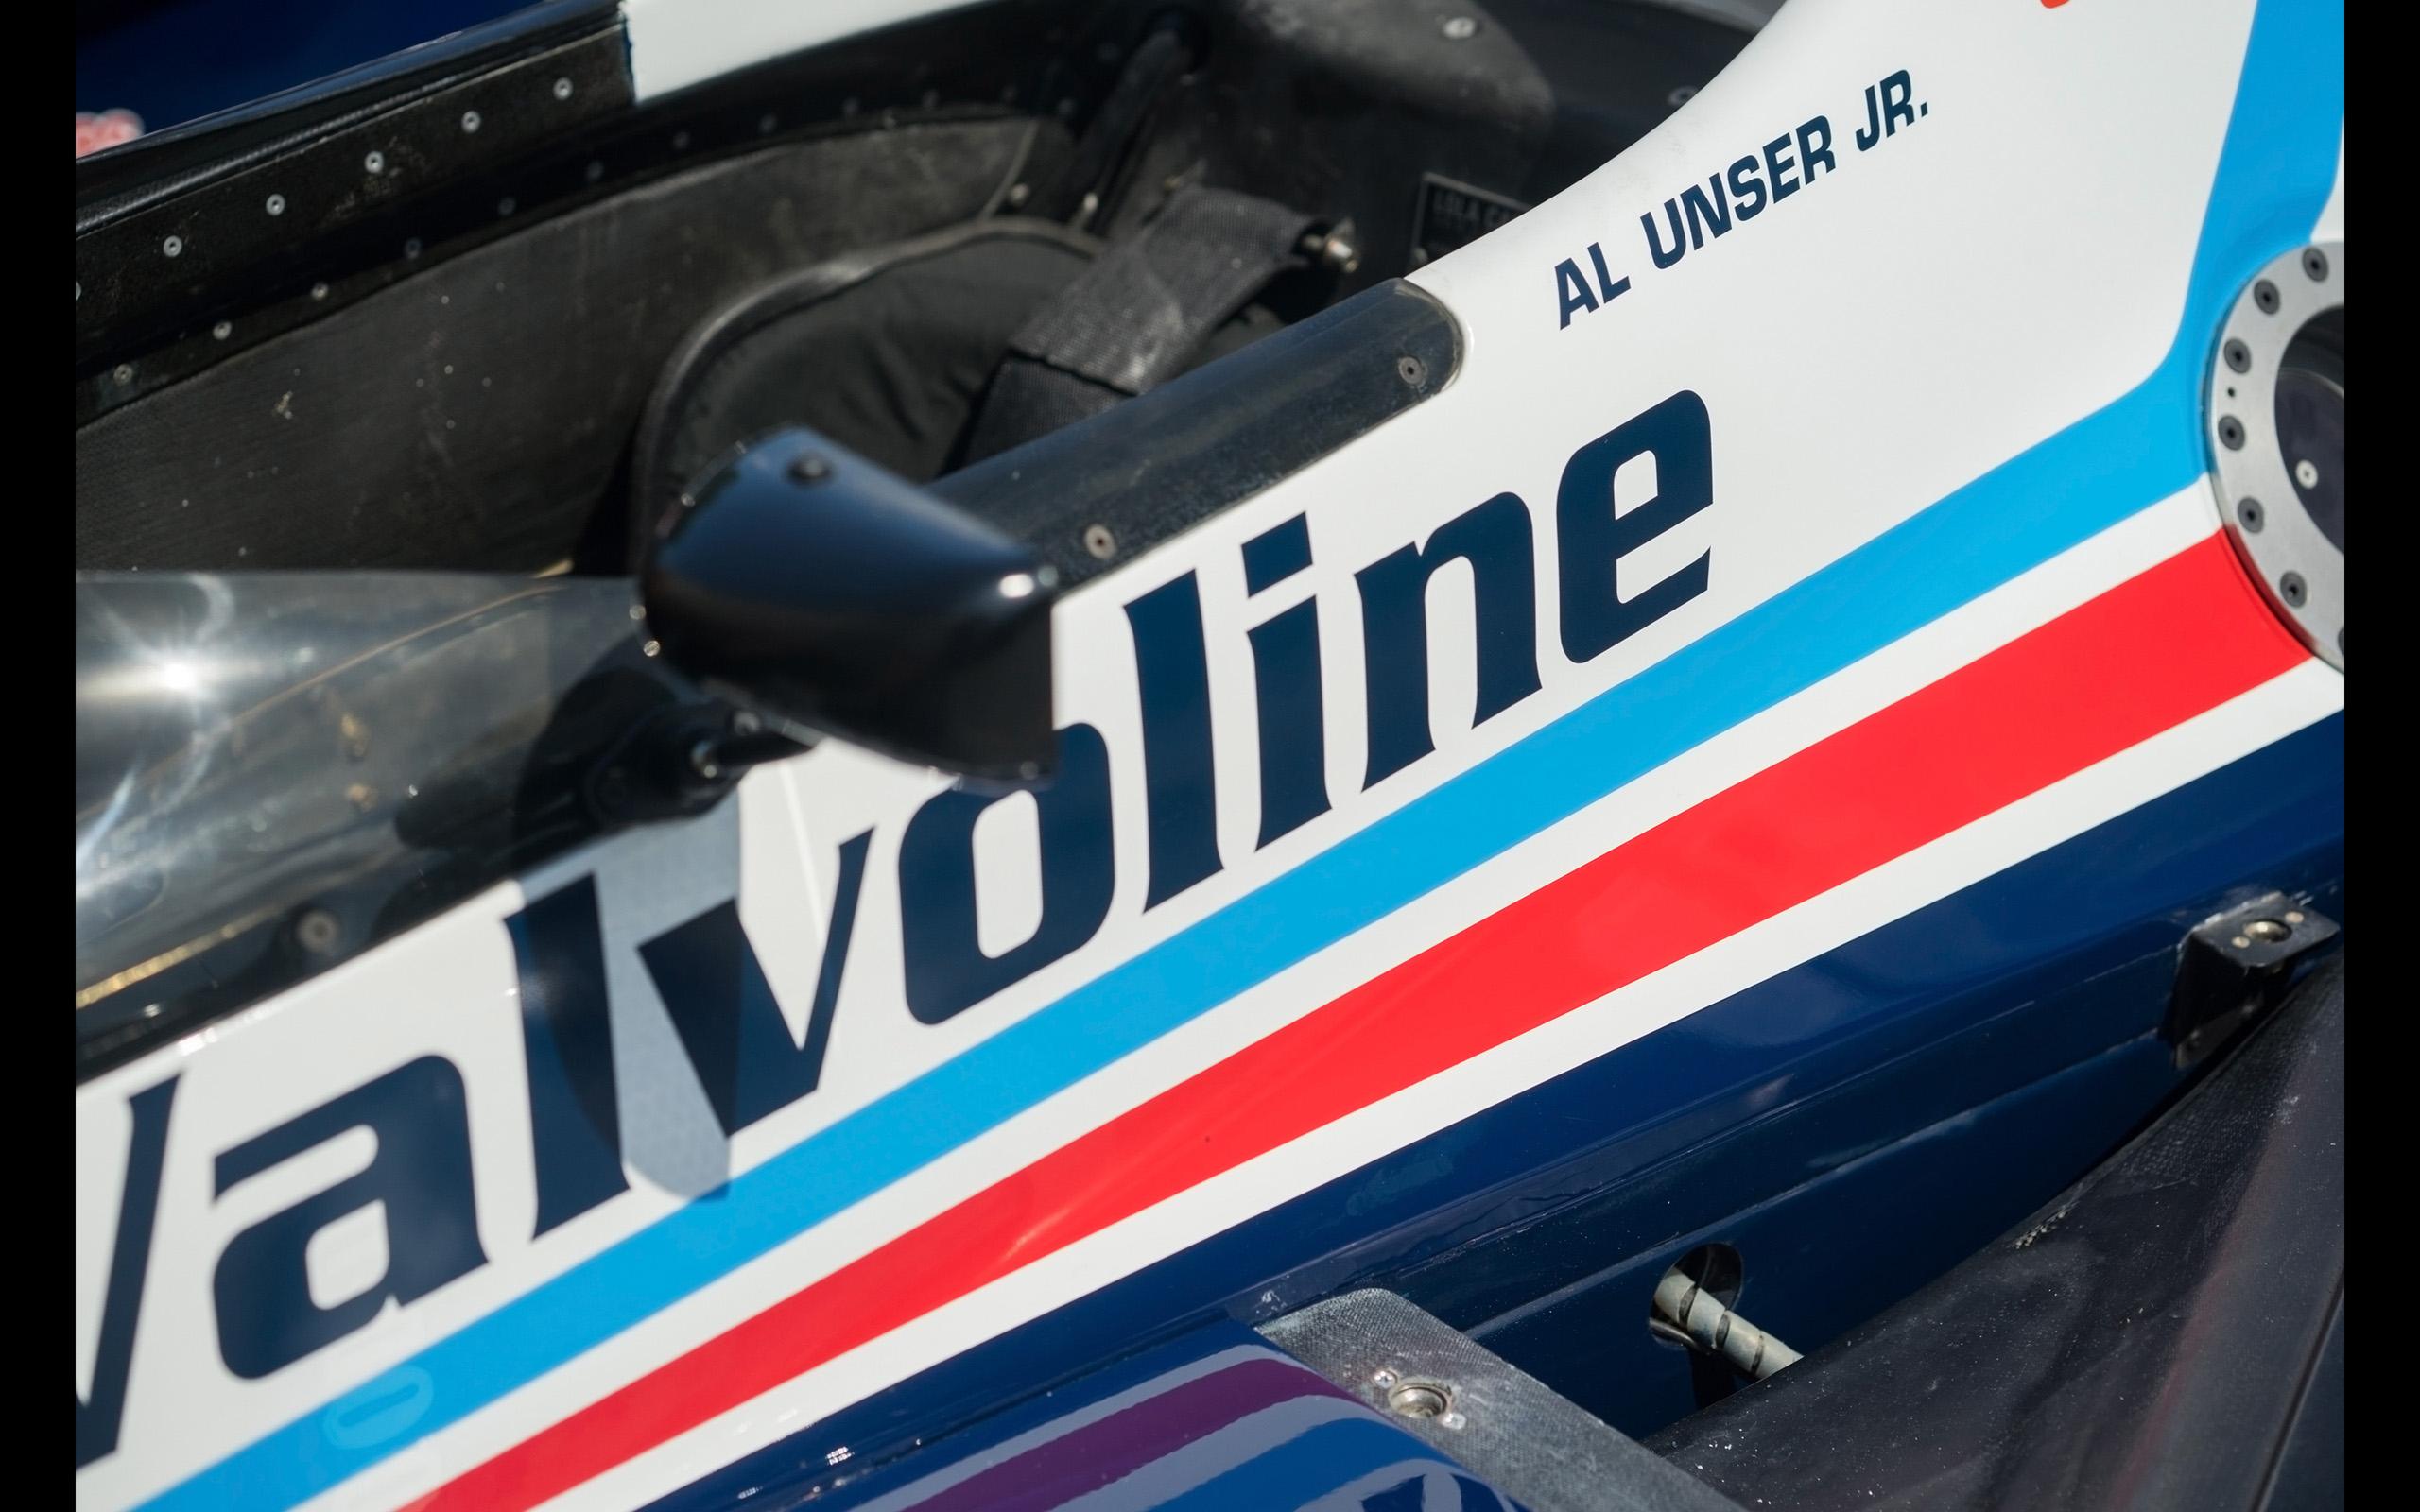 1990 Lola T9000 Valvoline Indy Car   Details   5   2560x1600 2560x1600